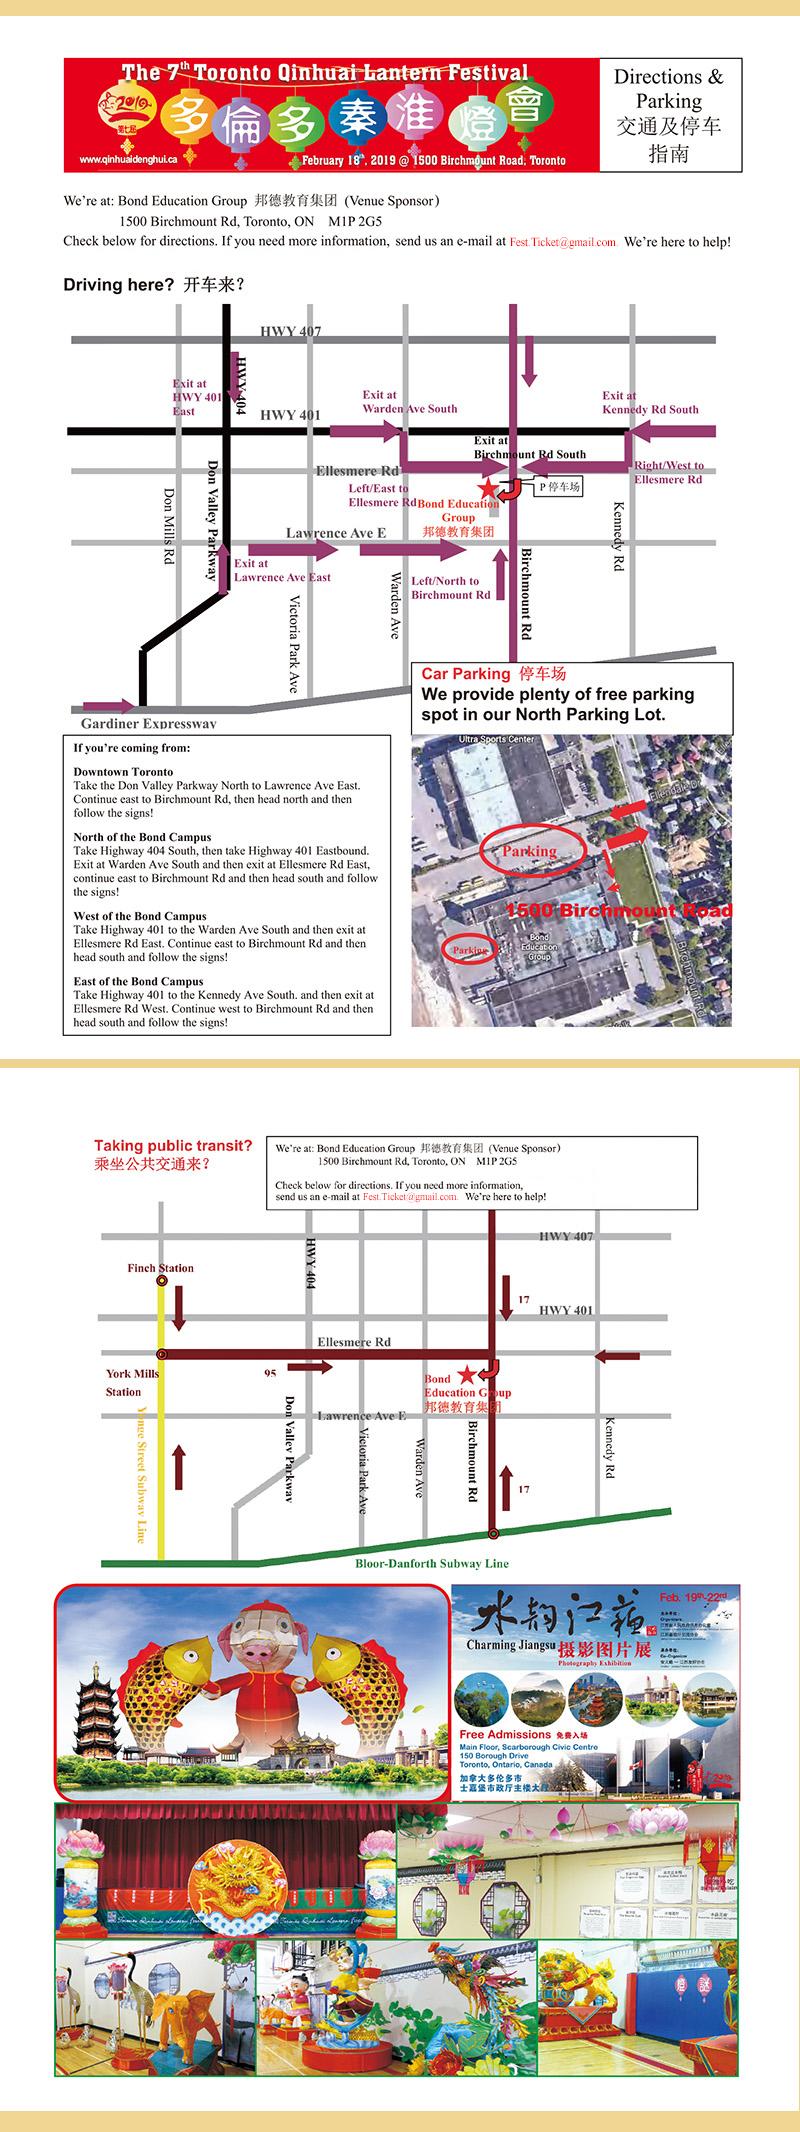 Lantern Fest_Transportation and Free Public Parking